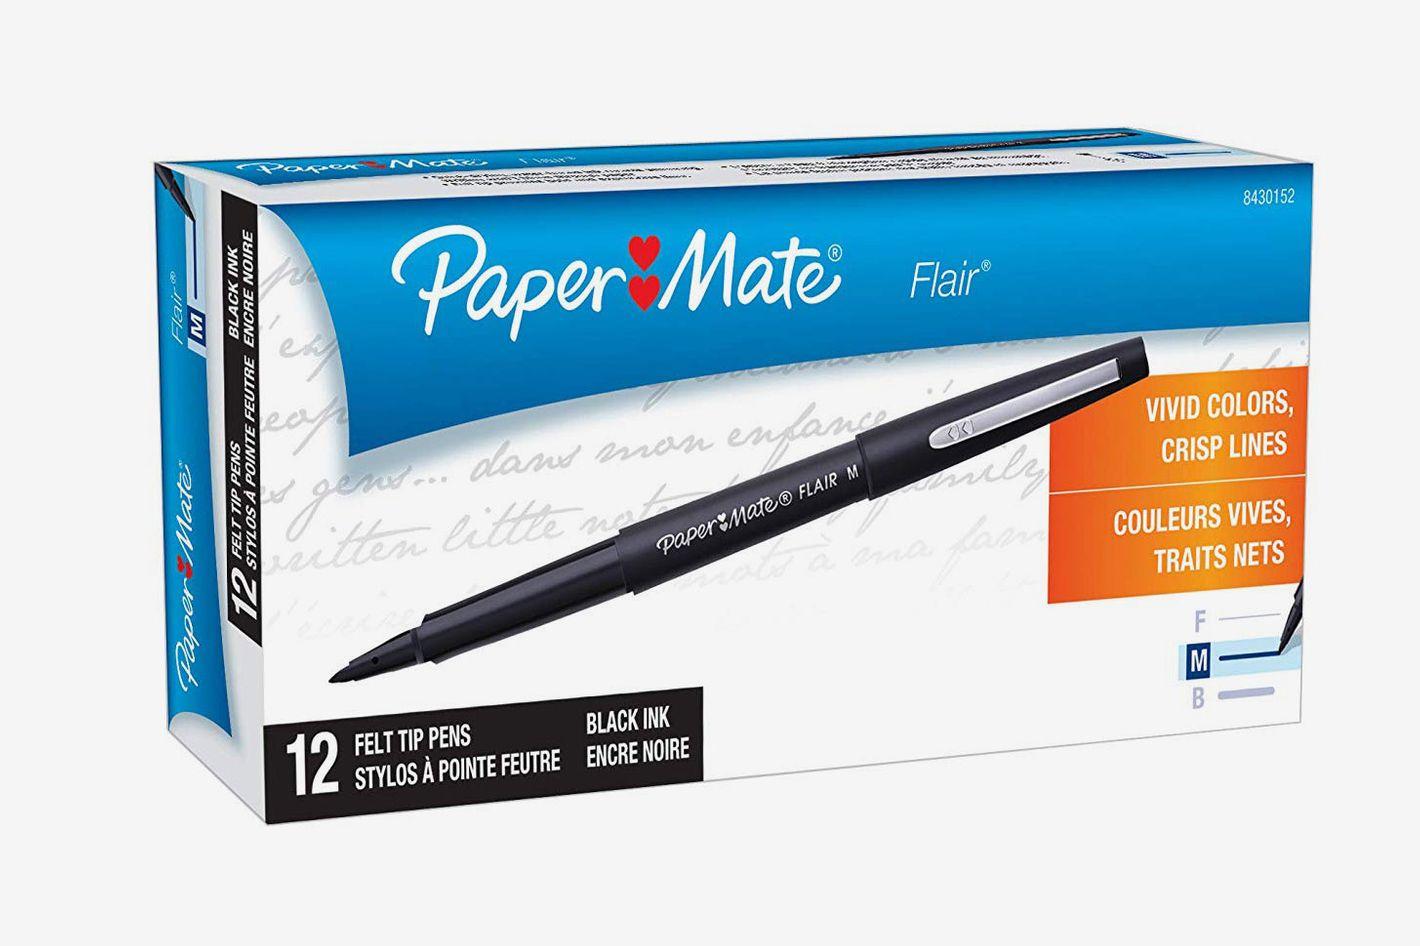 Paper Mate Flair Felt Tip Pens, Medium Point (0.7mm), Black, 12 Count